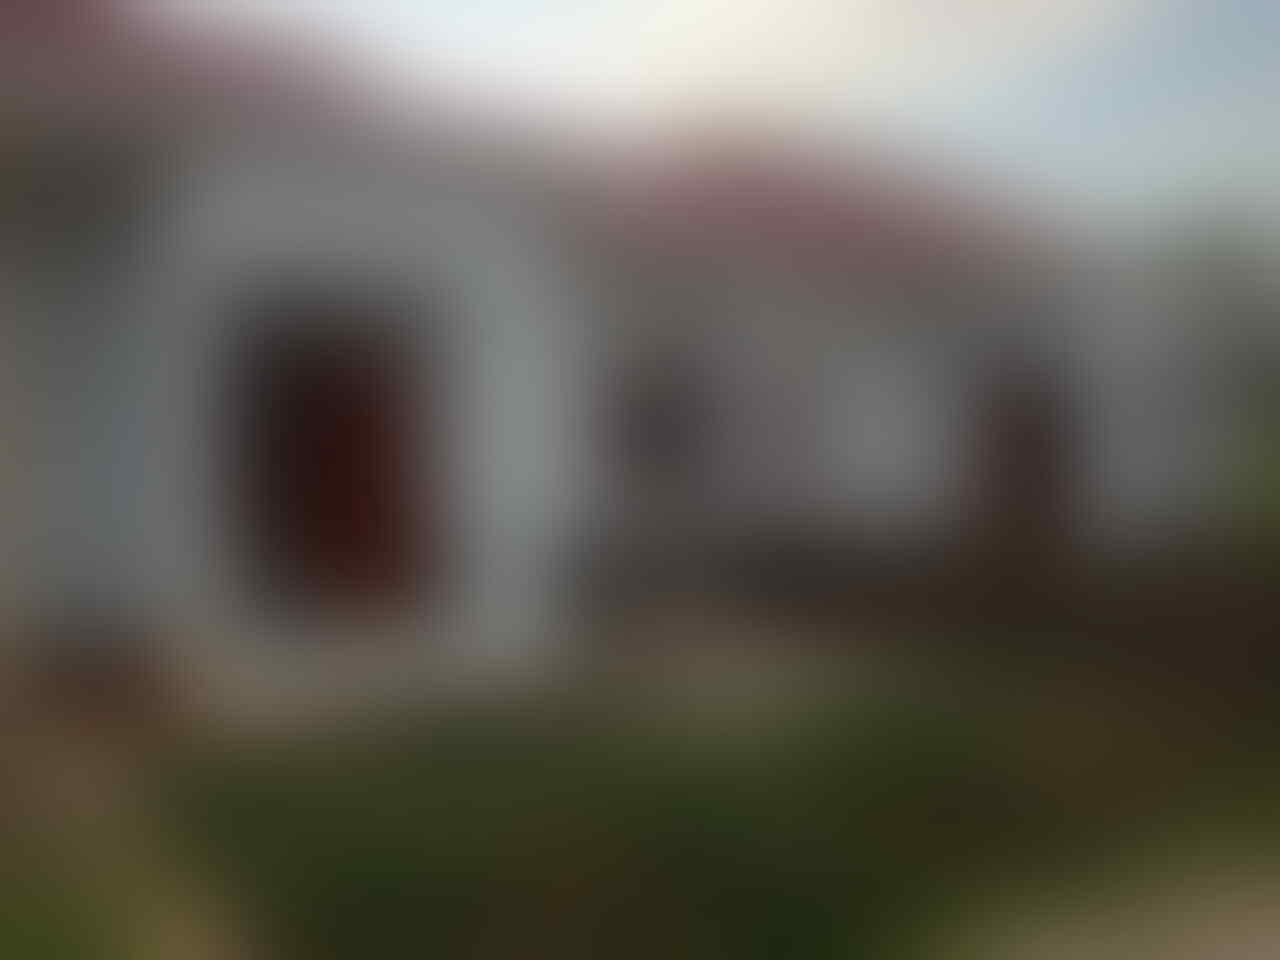 DIjual Rumah minimalis tipe 90/45 daerah Serua. Harga Promosi!!!